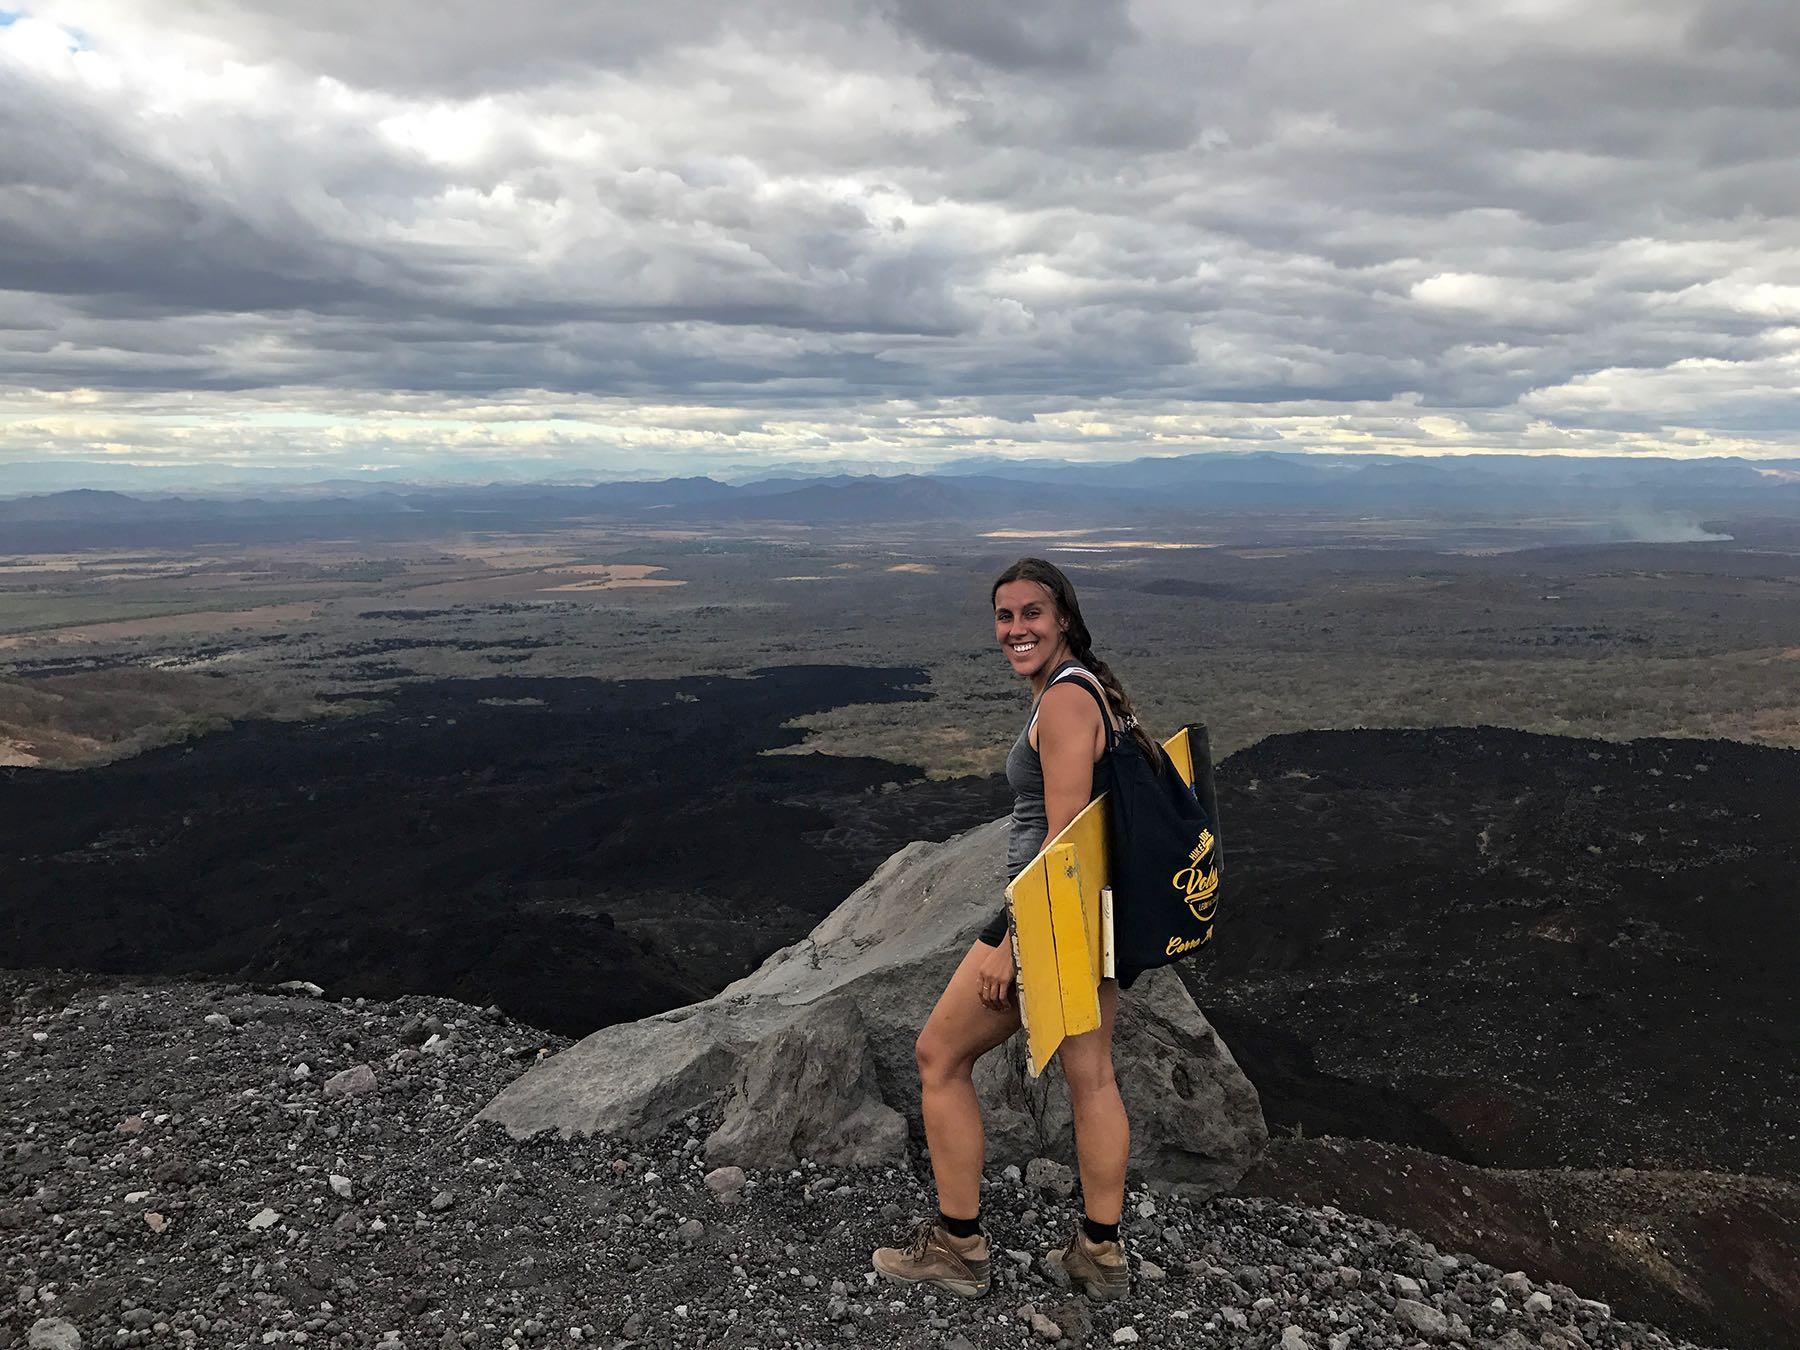 Sapphire & Elm Co-Founder, Stephanie Hiking up Cerro Negro for Volcano Boarding